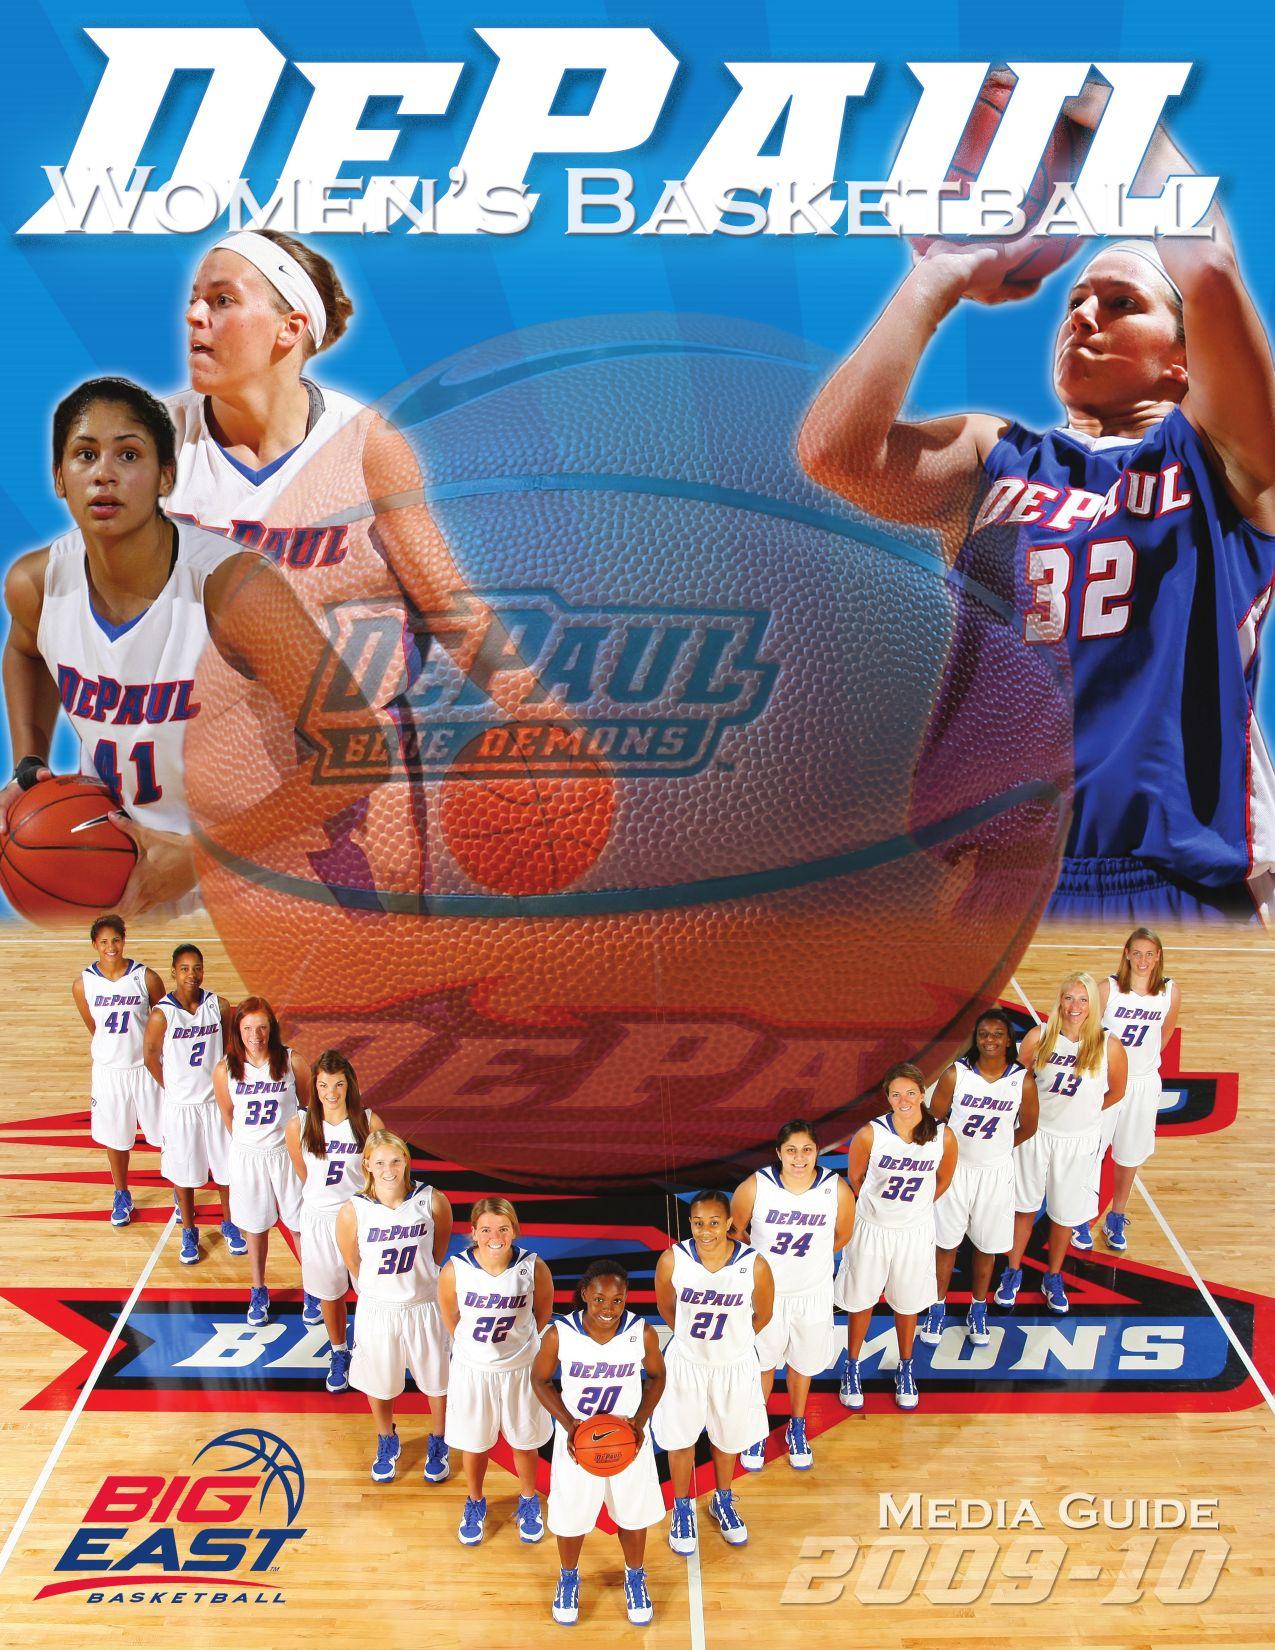 ff228a3f058c 2009-10 Women s Basketball Media Guide by DePaul Athletics - issuu